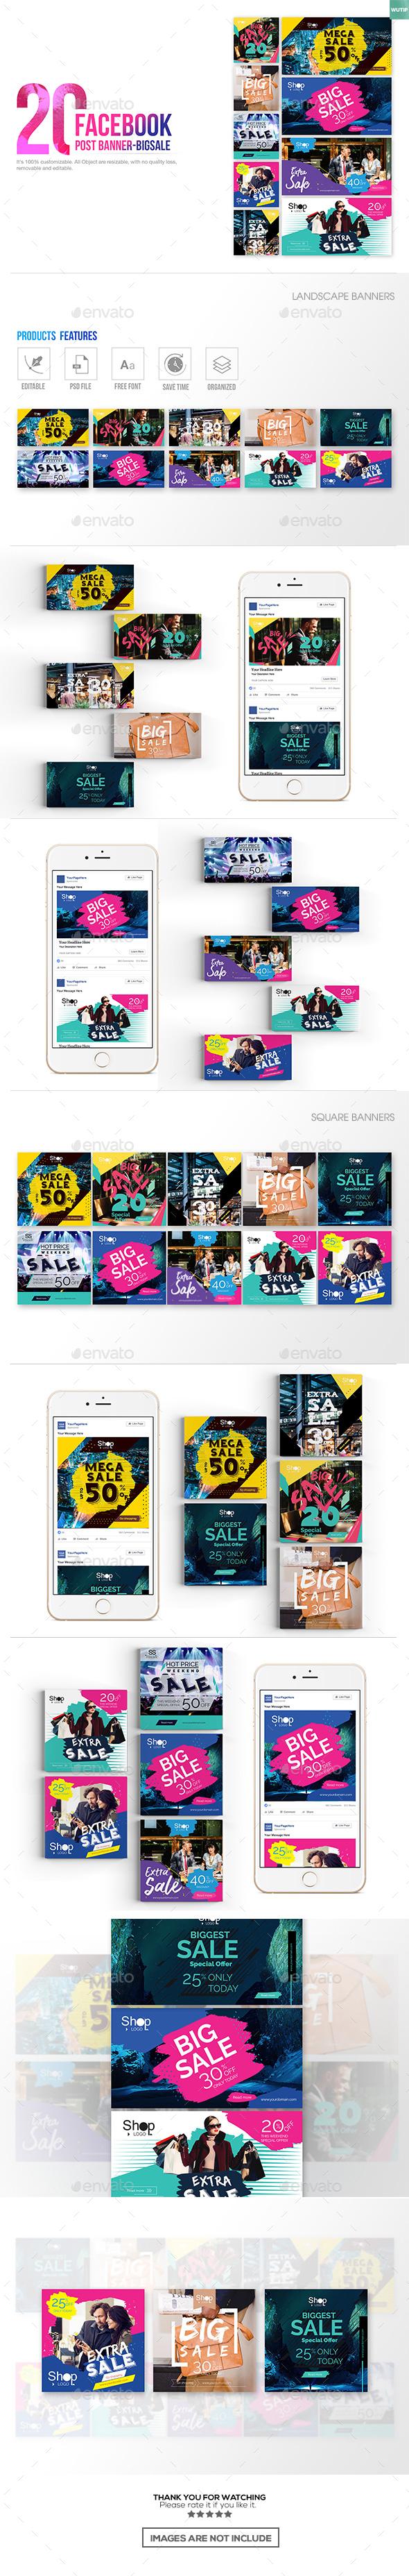 20 Facebook Post Banner - Big Sale - Miscellaneous Social Media